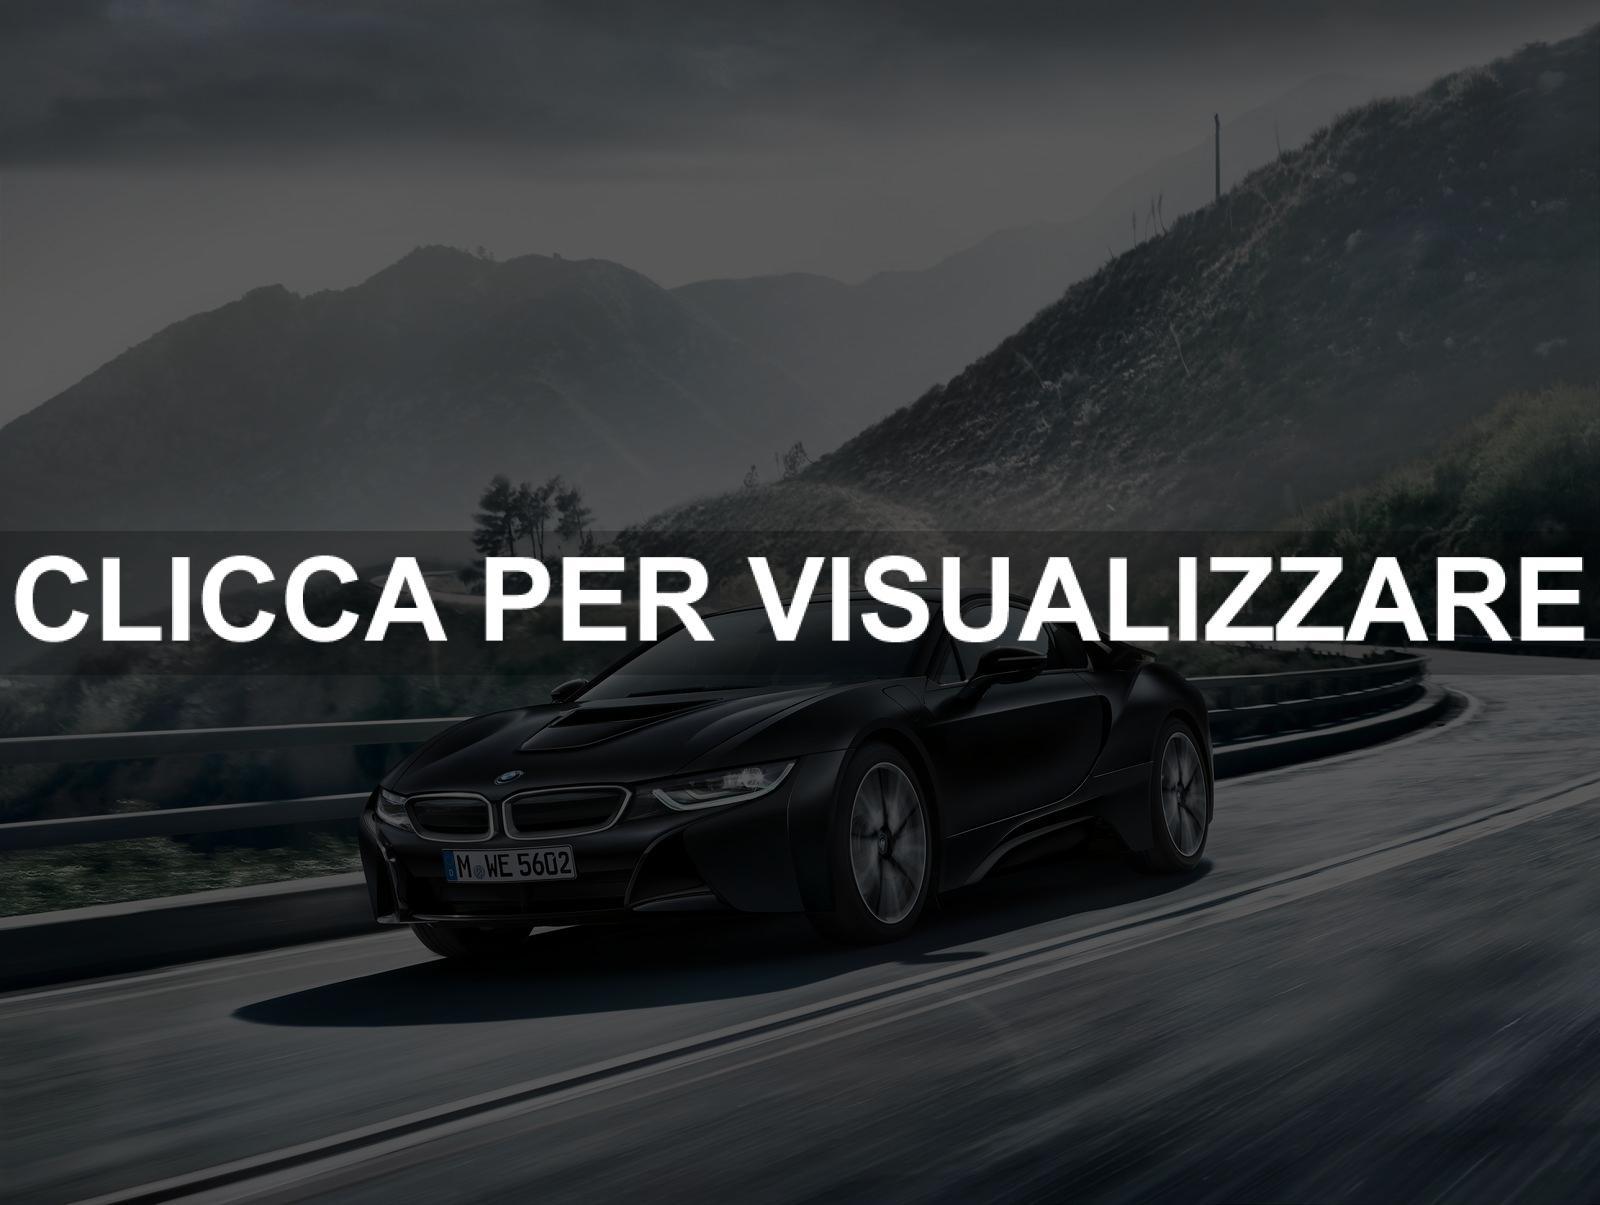 Nuova ibrida BMW i8 Frozen Black 2017